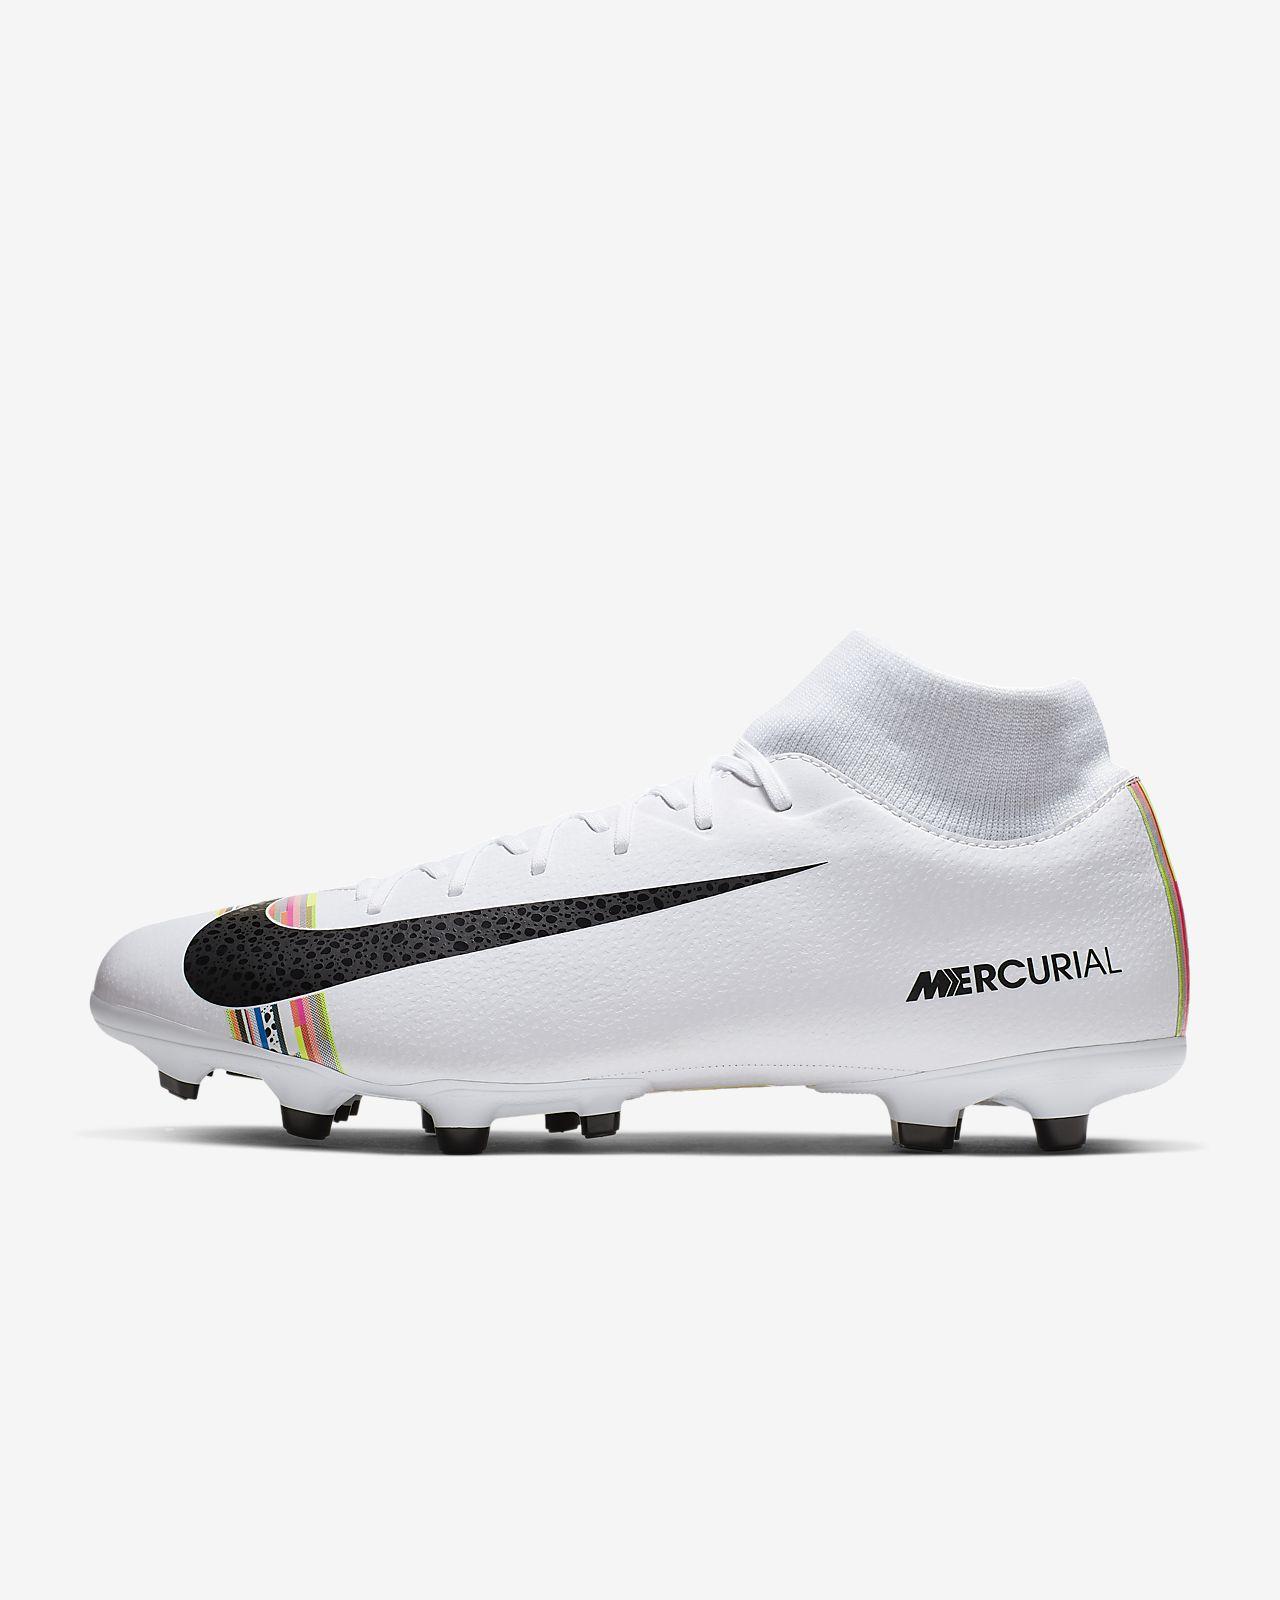 super popular 5e2f5 527cb ... Nike Mercurial Superfly 6 Academy LVL UP MG Fußballschuh für  verschiedene Böden